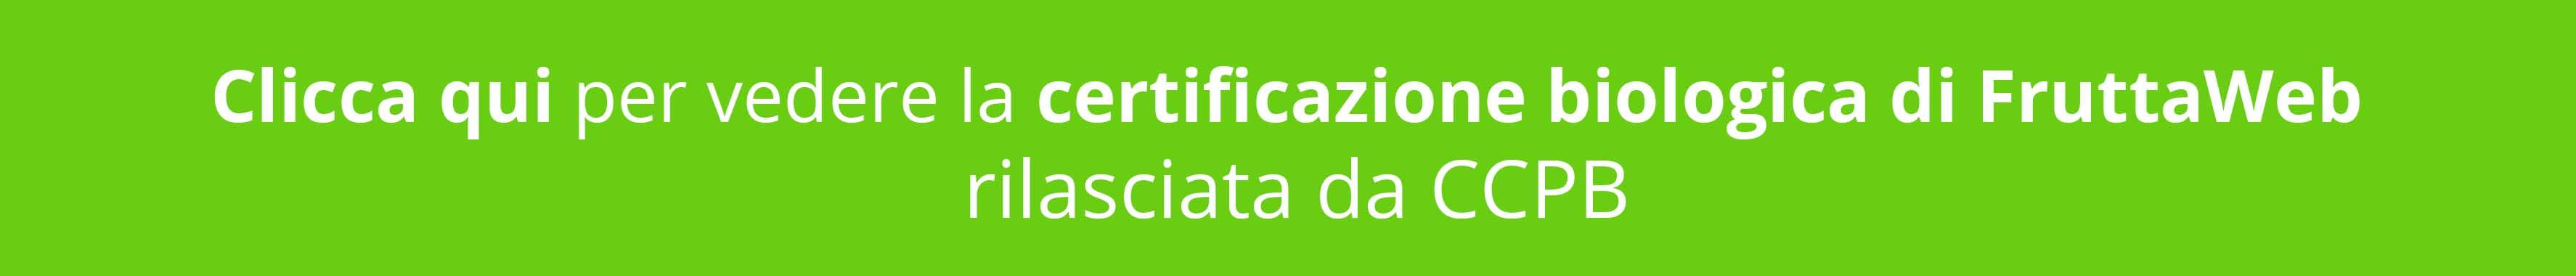 Scarica ora la certificazione biologica di FruttaWeb certificata dal CCPB